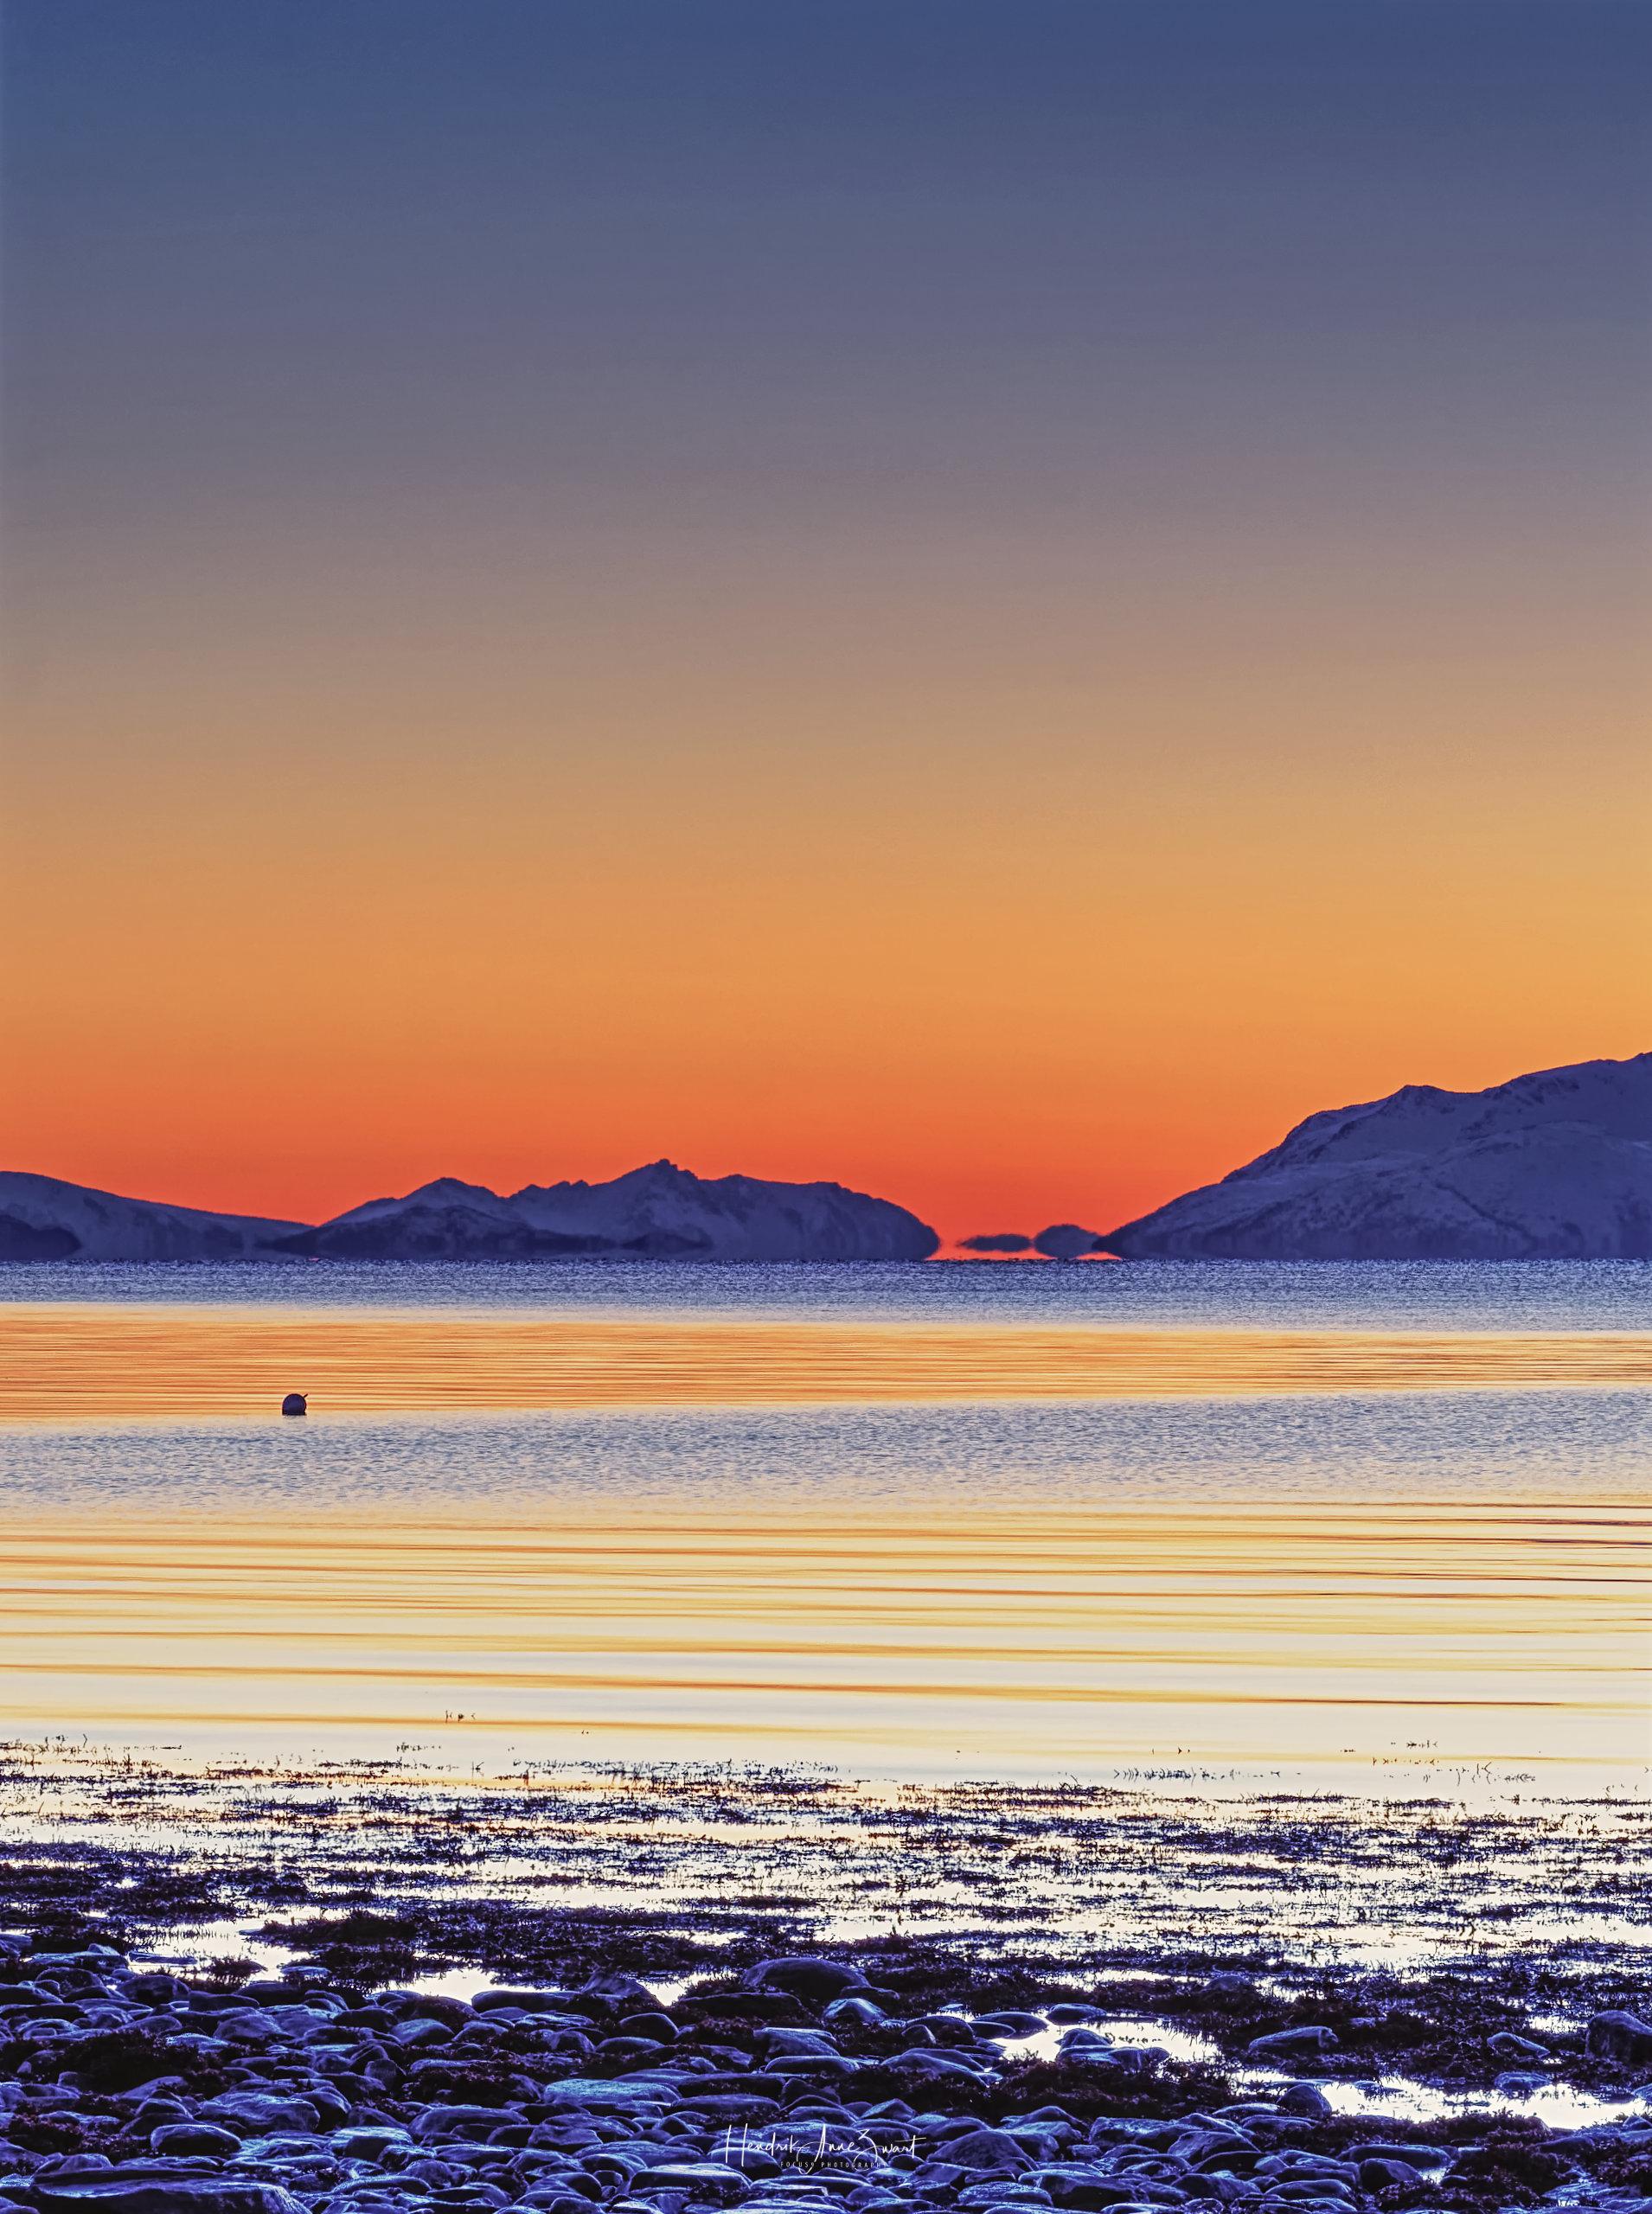 Tømmervik_Sunset_Norway_2.jpg